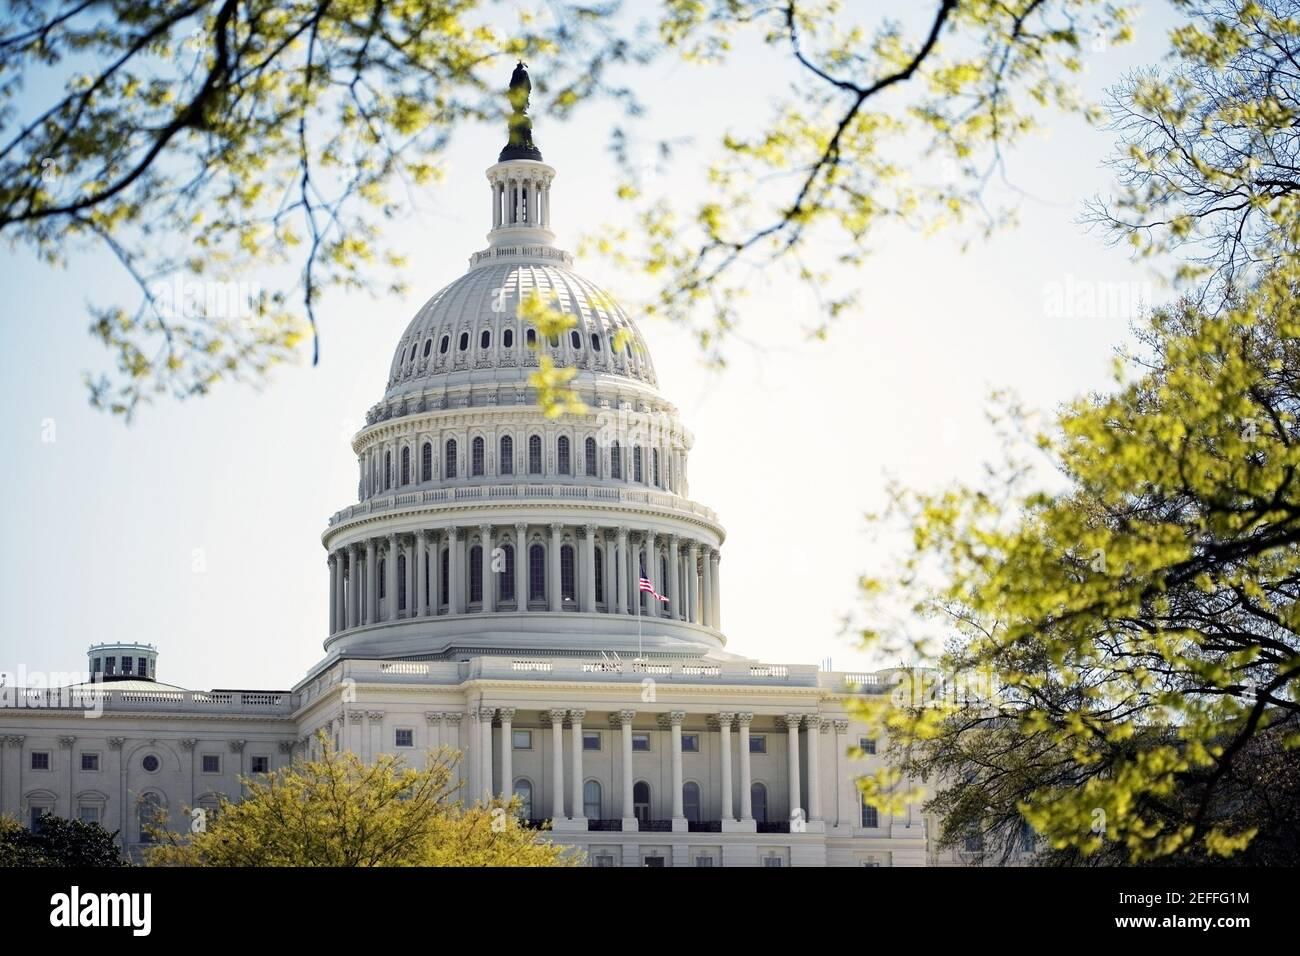 Facade of the United States Capitol Building, Washington DC, USA Stock Photo